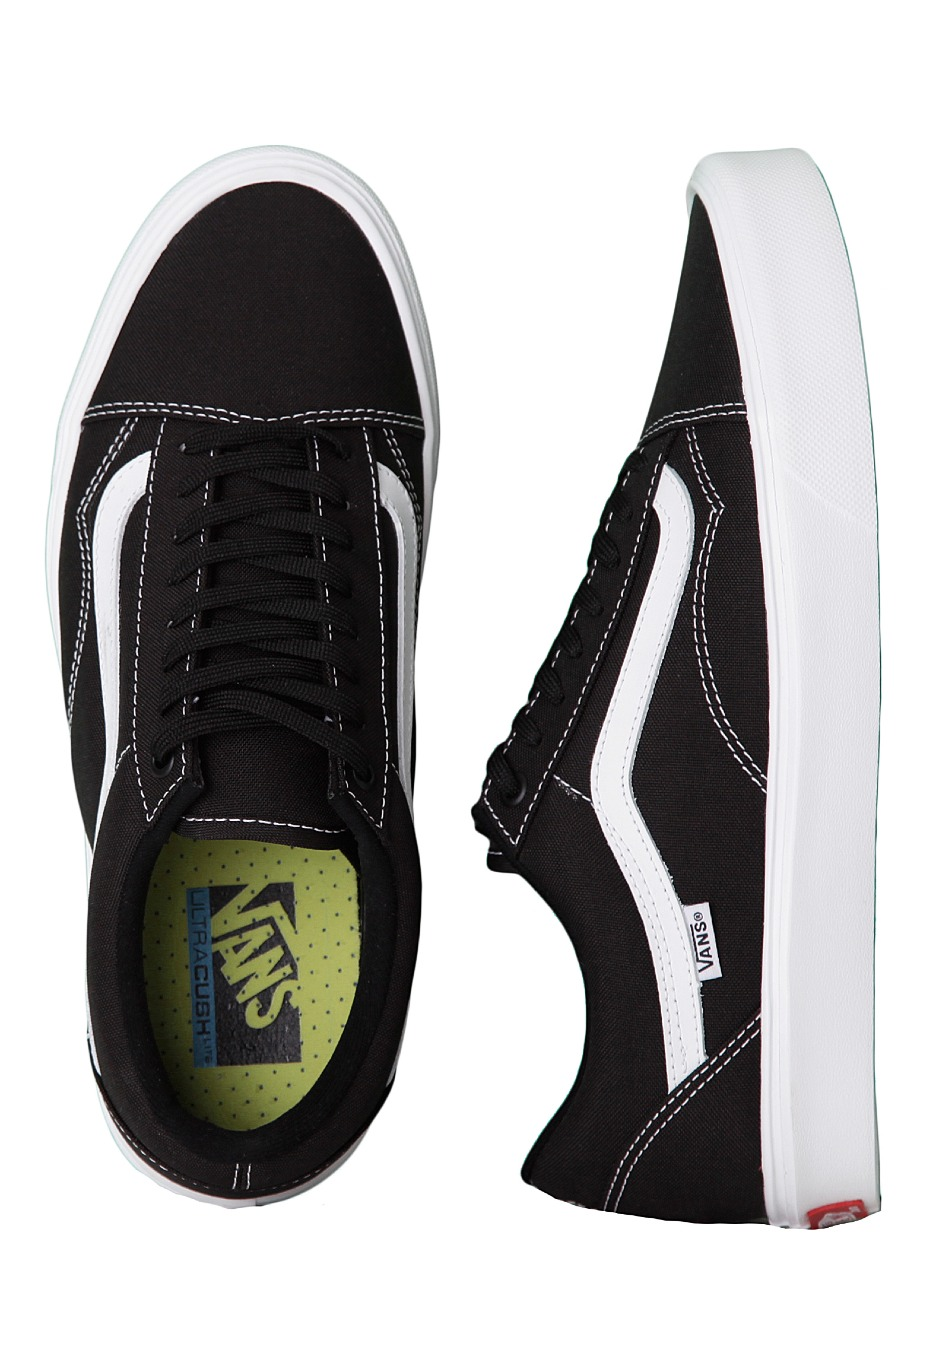 Old Skool Worldwide Lite Vans Shoes White Blacktrue SvRxwB